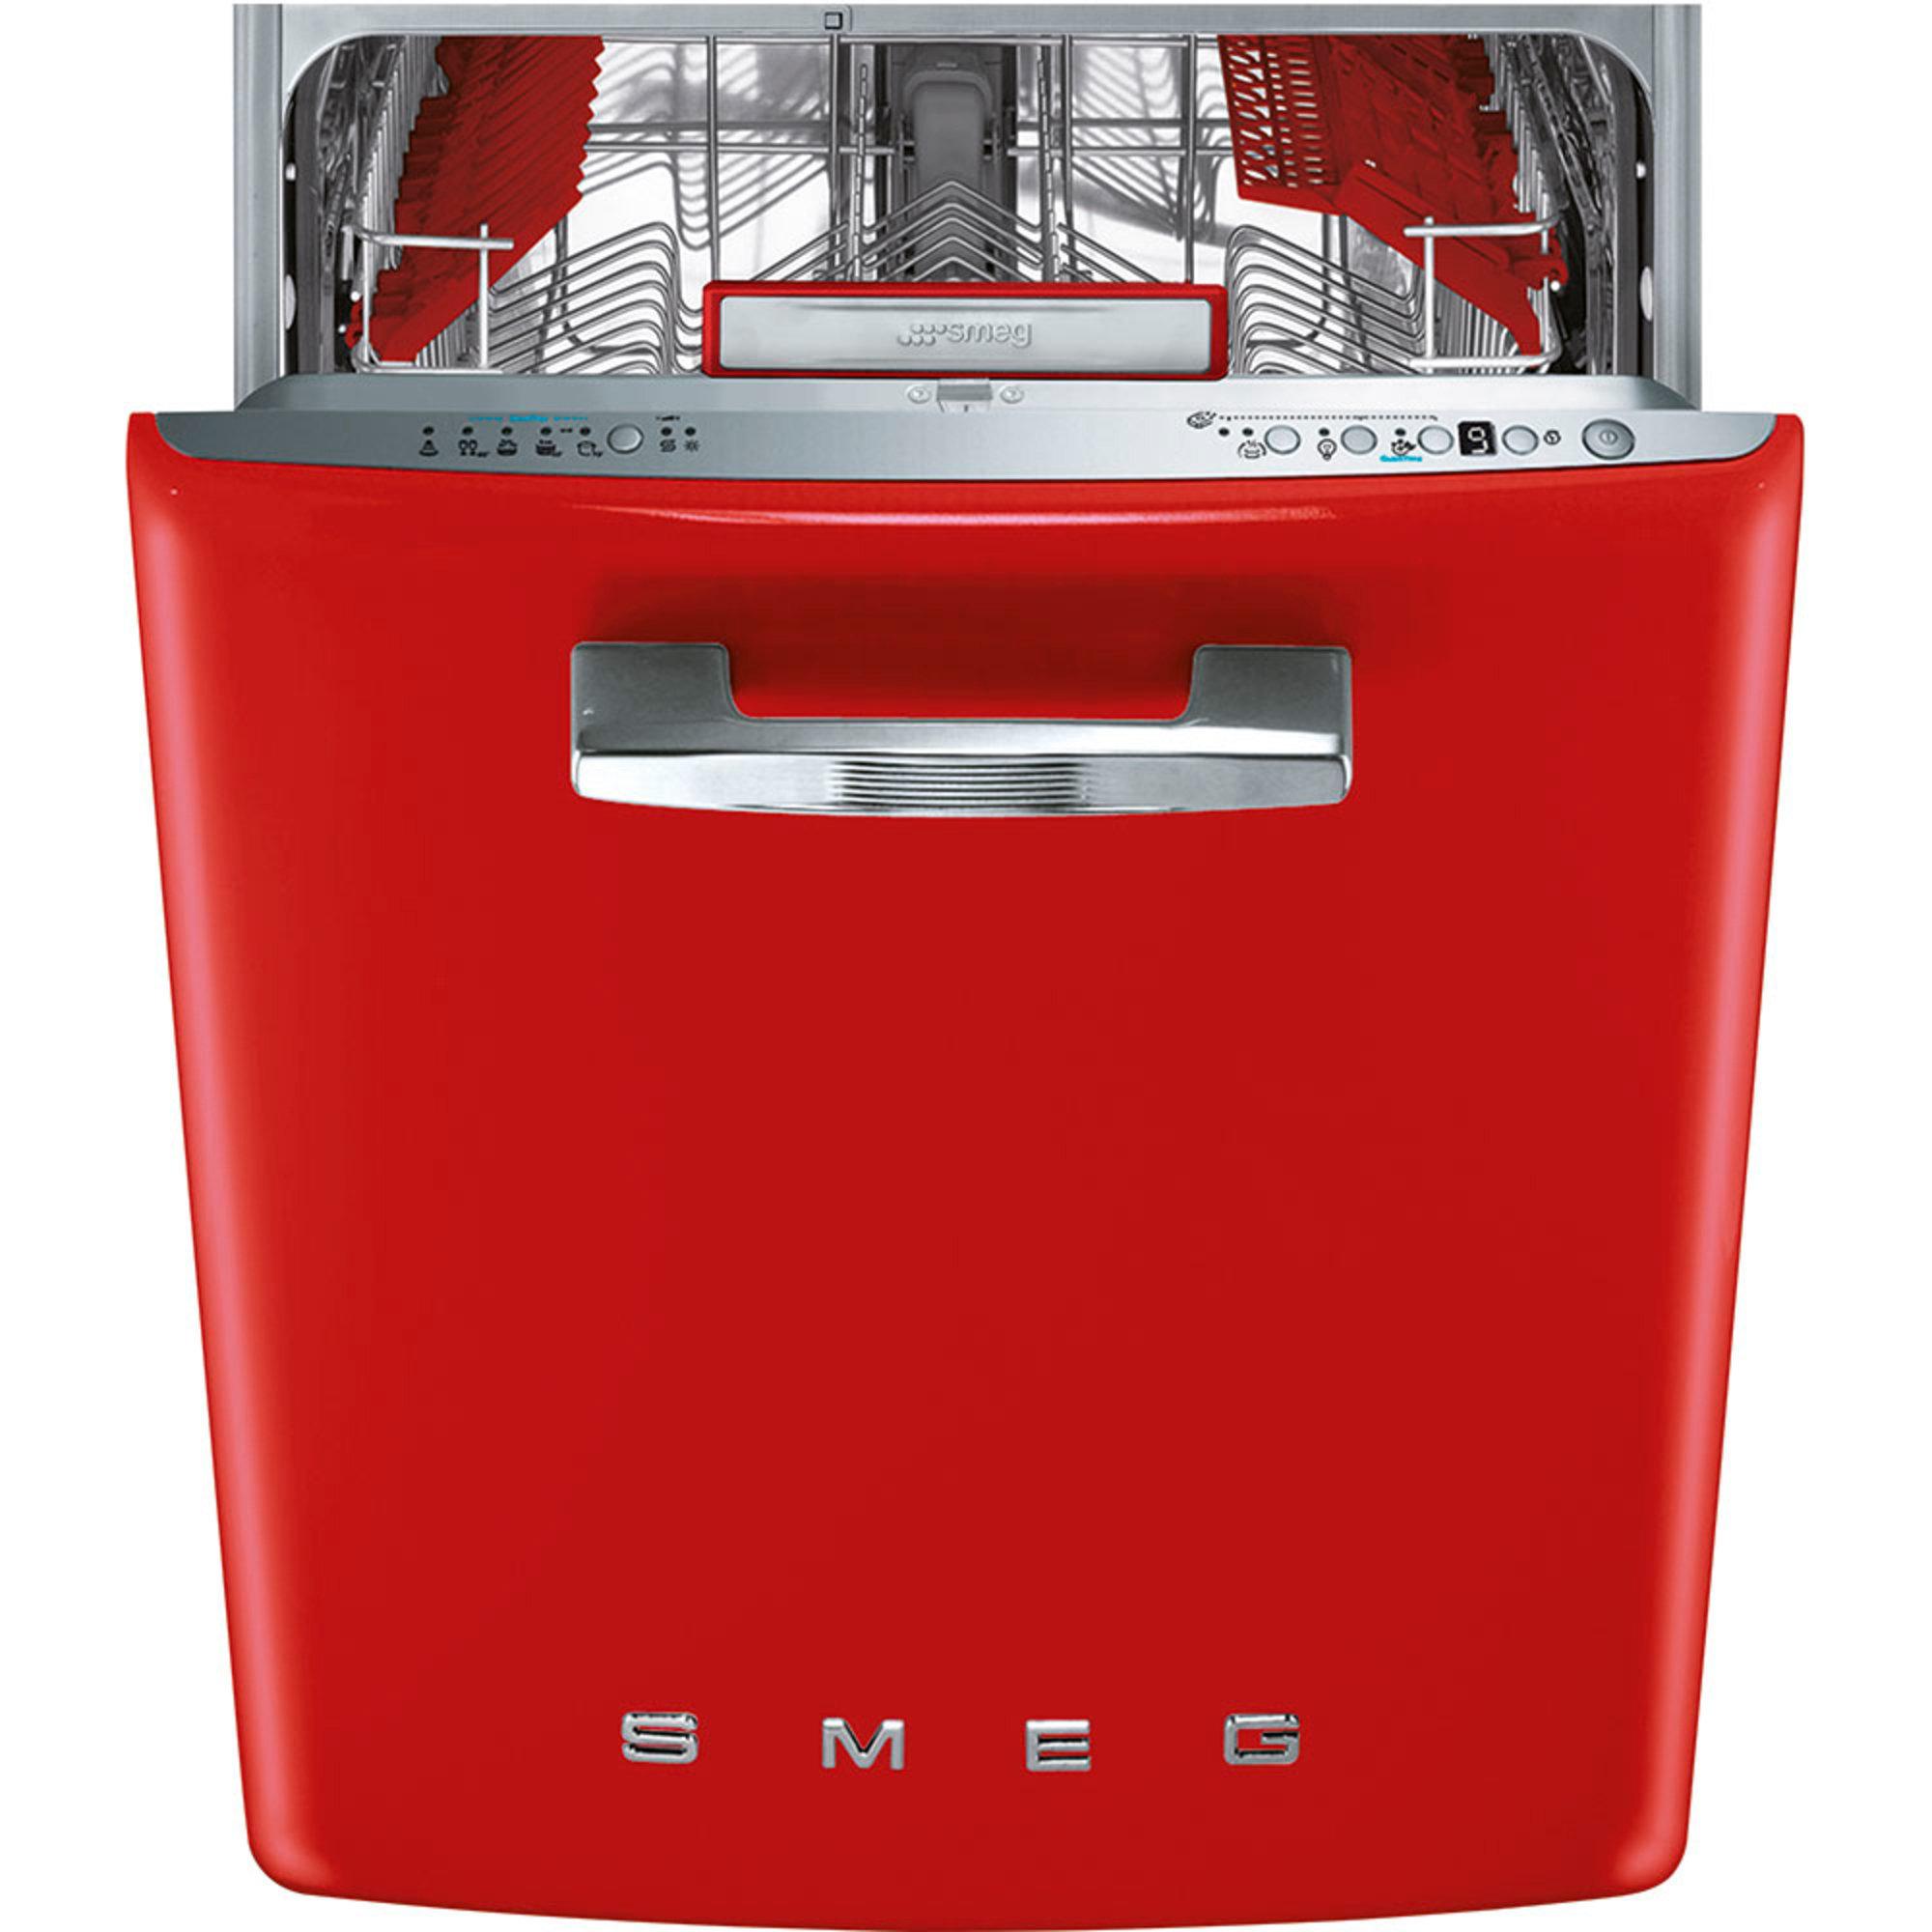 Smeg 60 CM Diskmaskin i retrostil röd A+++A